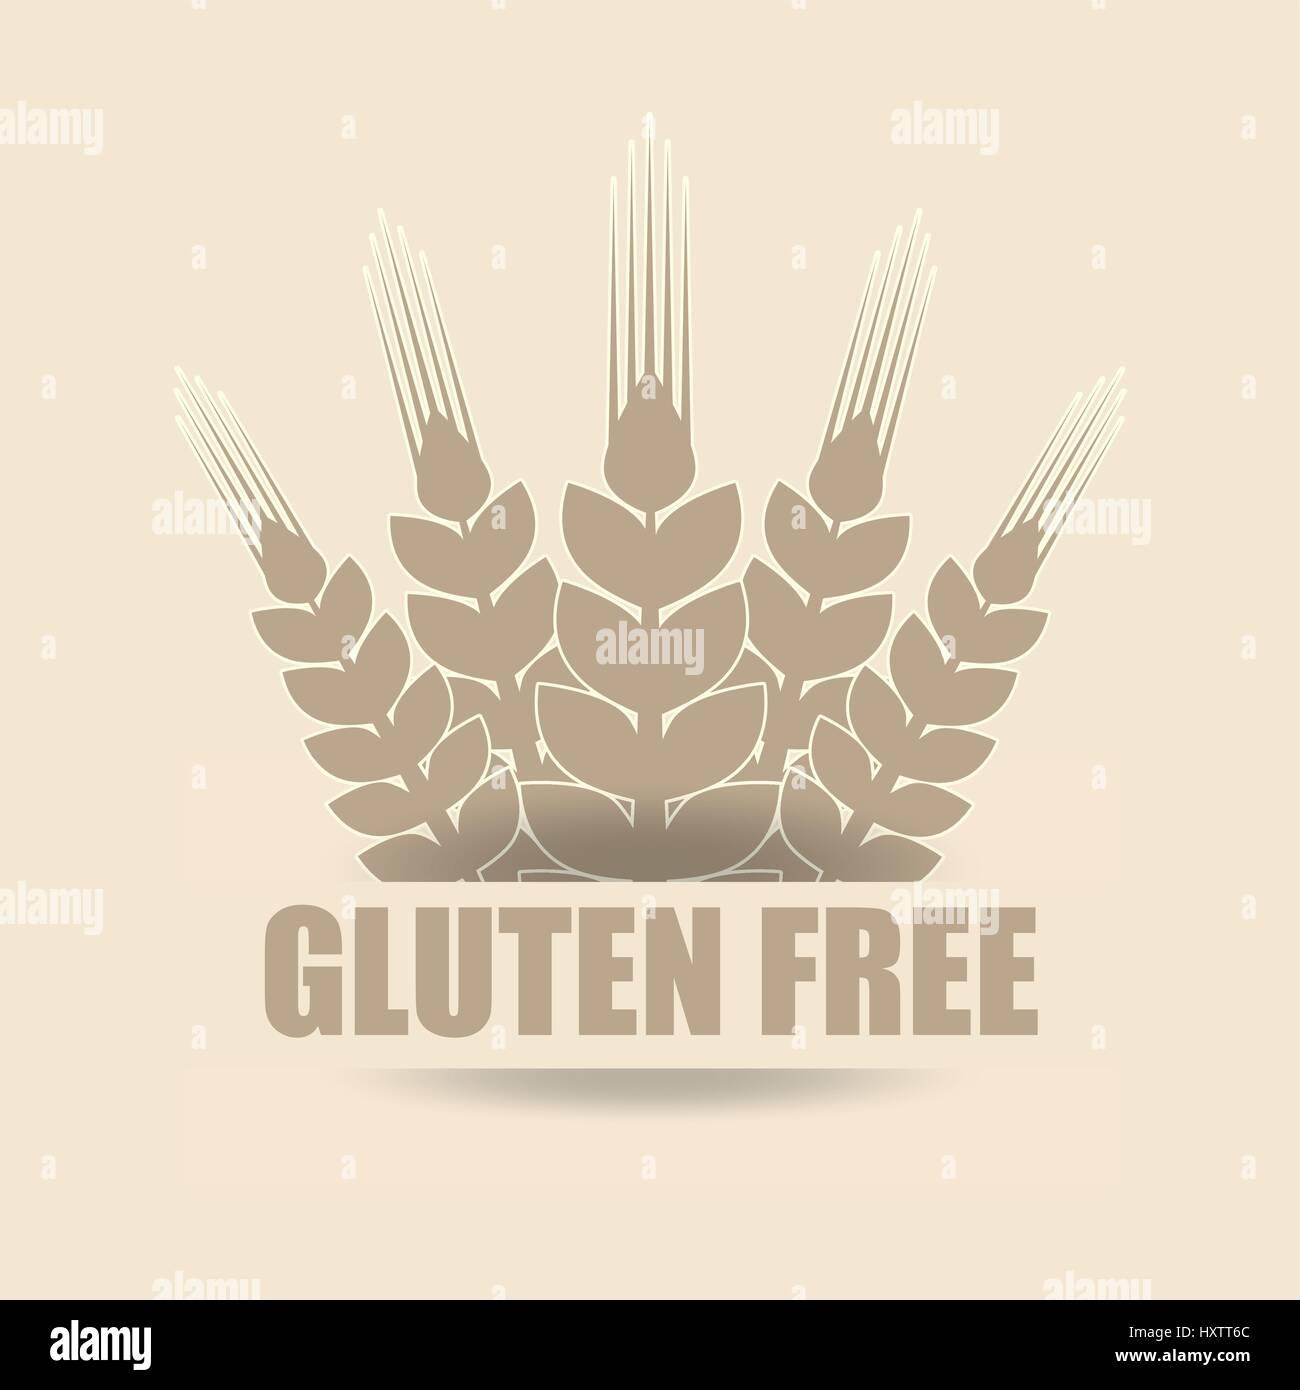 Gluten Free Bread Label Stock Photos & Gluten Free Bread